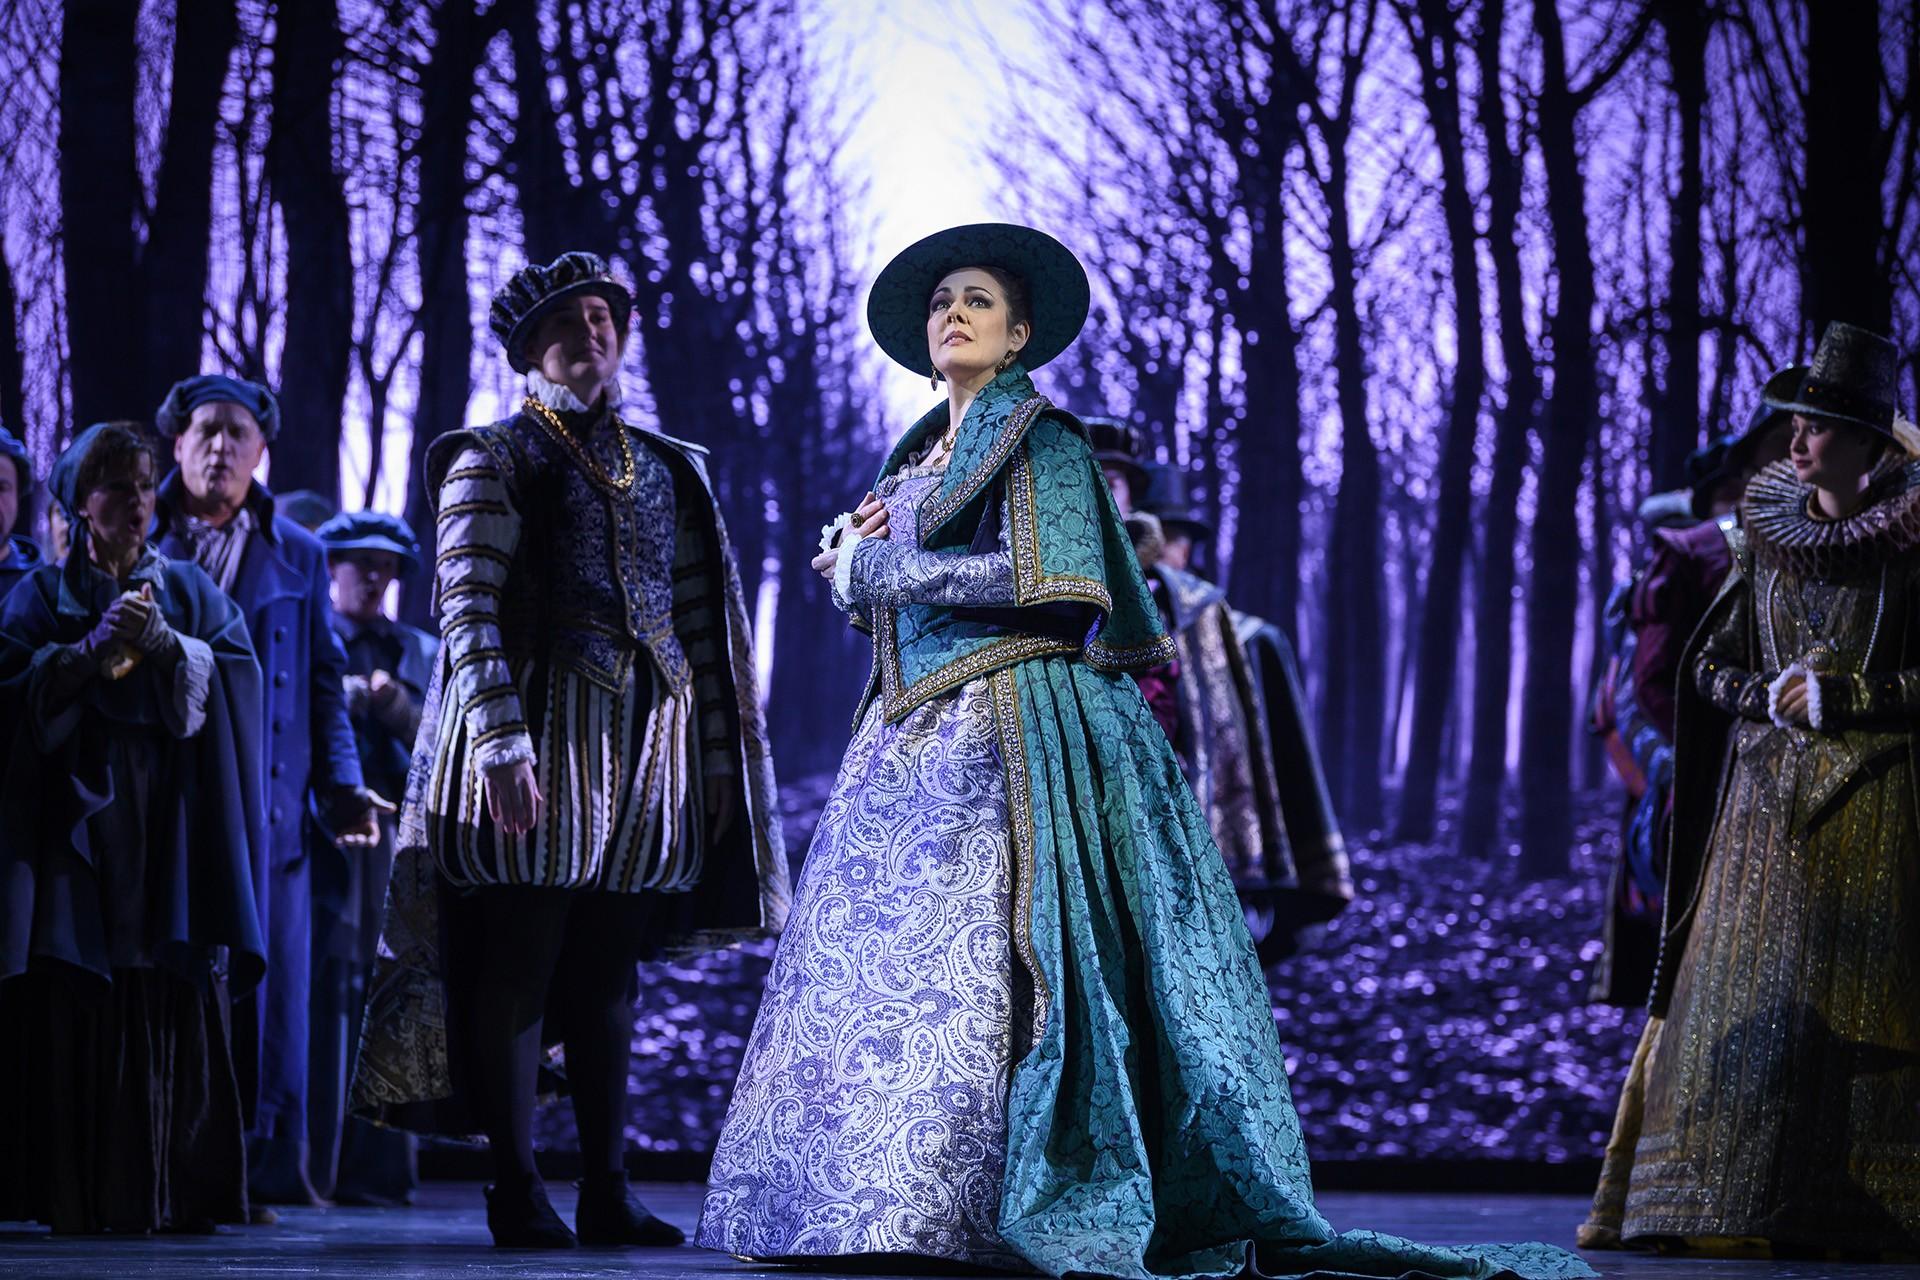 Opéra Royal de Wallonie - Don Carlos de Verdi - Yolanda Auyanet